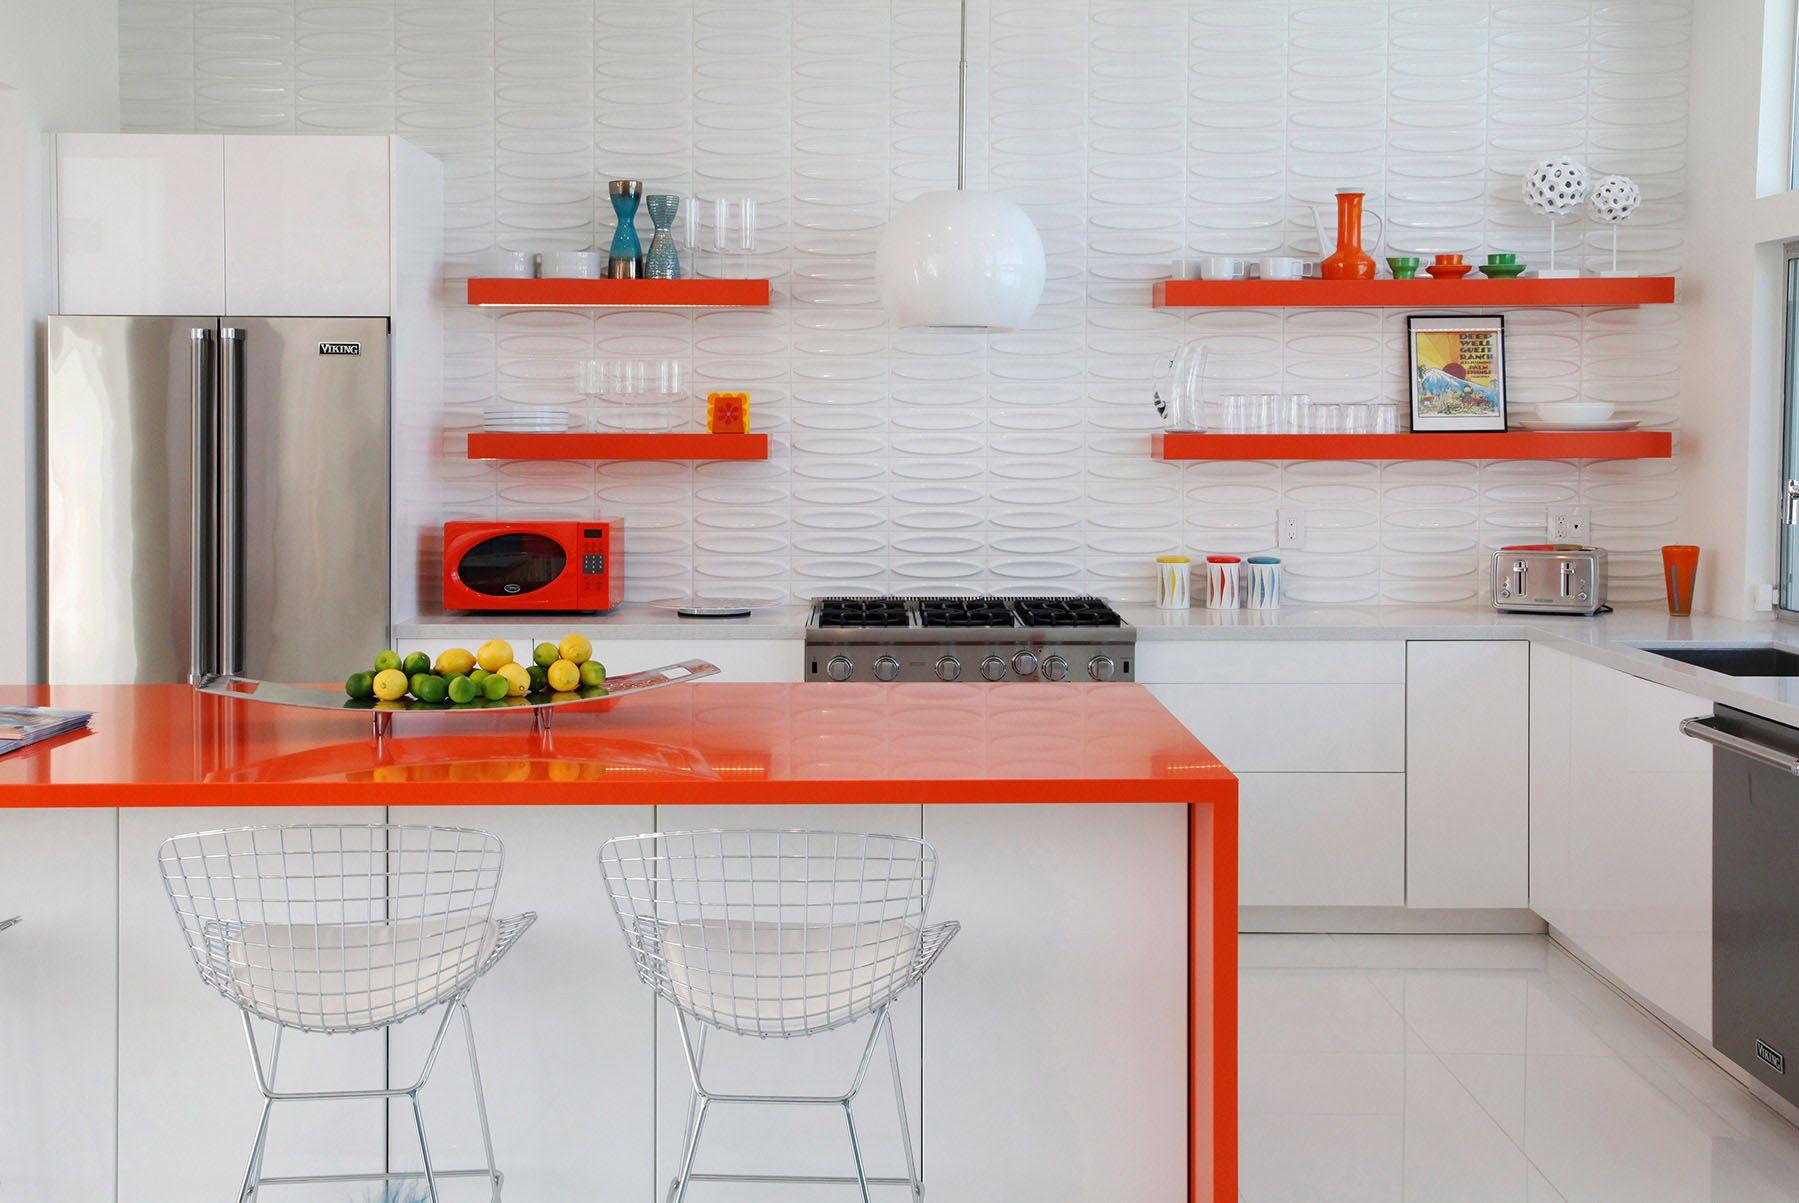 Kitchens & Dining 16.jpg